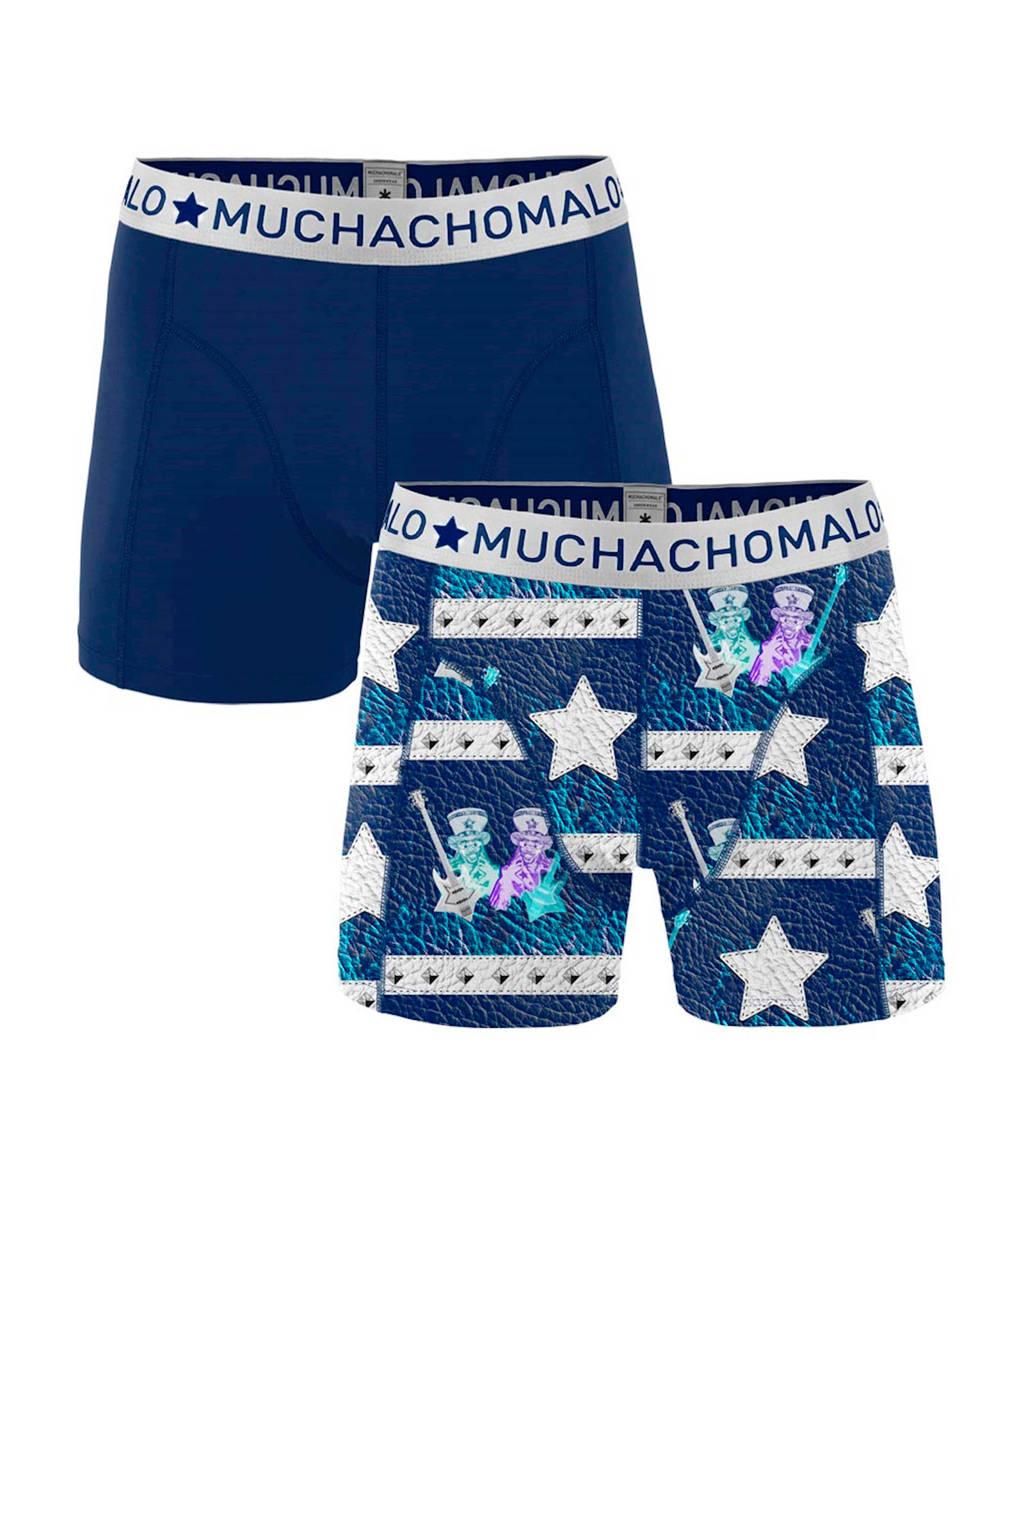 Muchachomalo   boxershort Funkadelic - set van 2, Blauw/wit